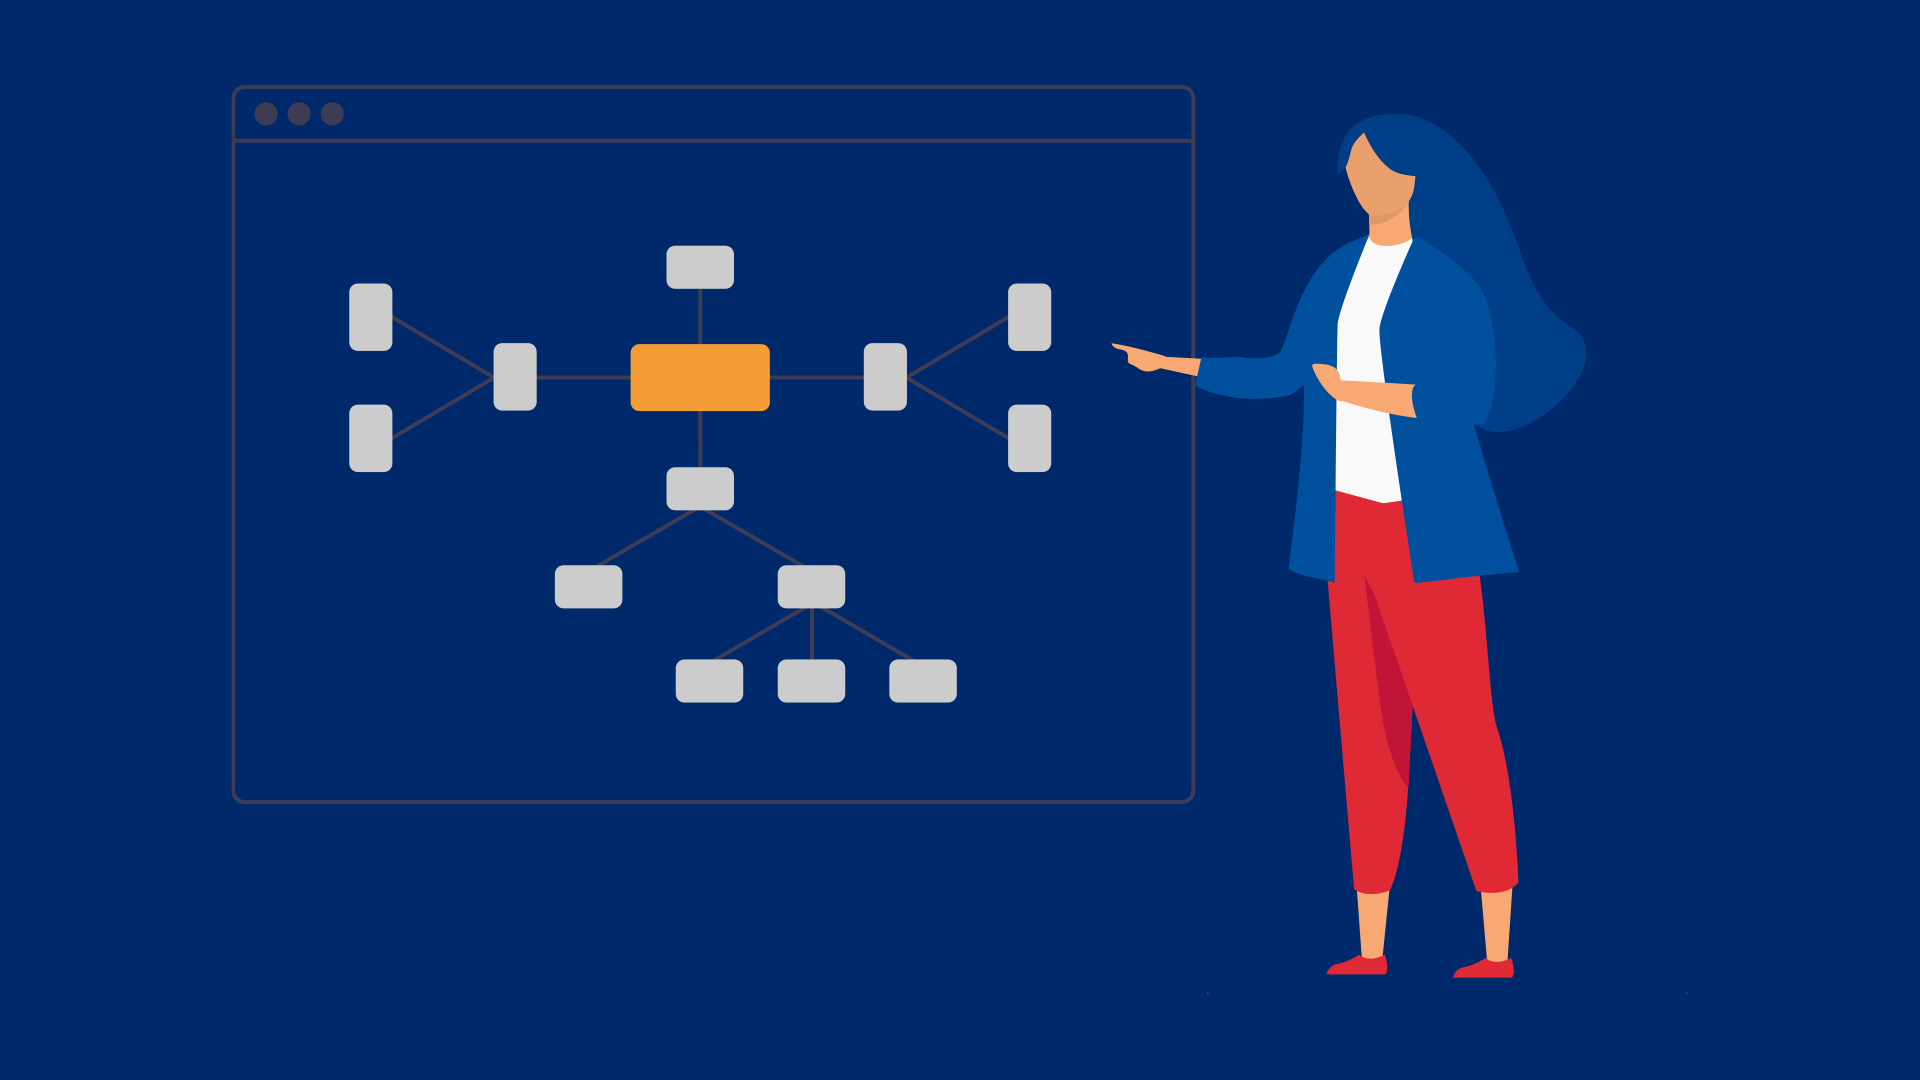 Matchilla-Matching-Plattform-Matchanfrage